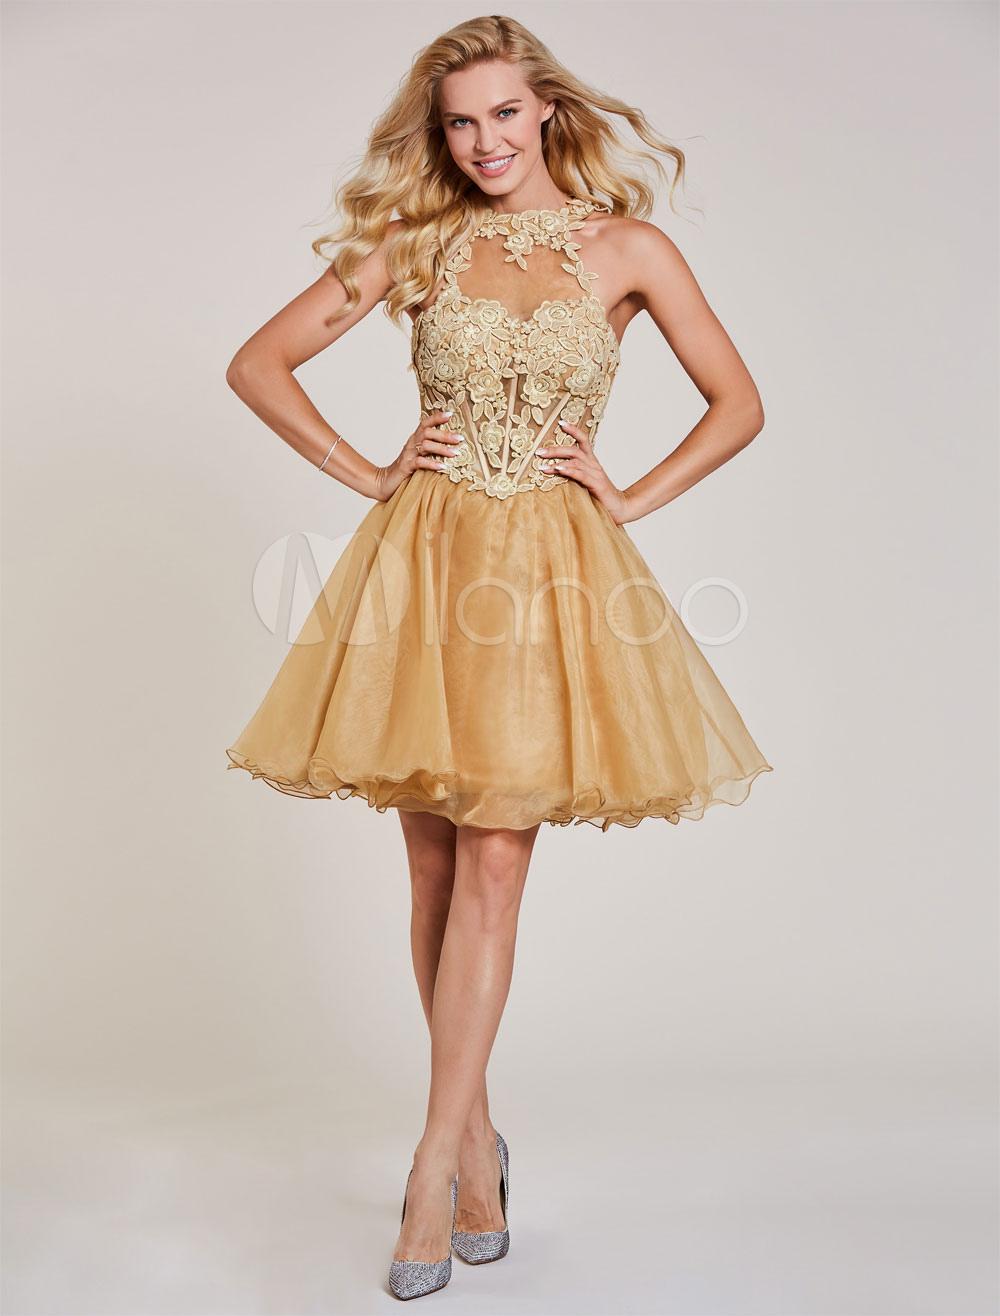 Short Prom Dresses Lace Tutu Graduation Dress Halter Light Gold ...